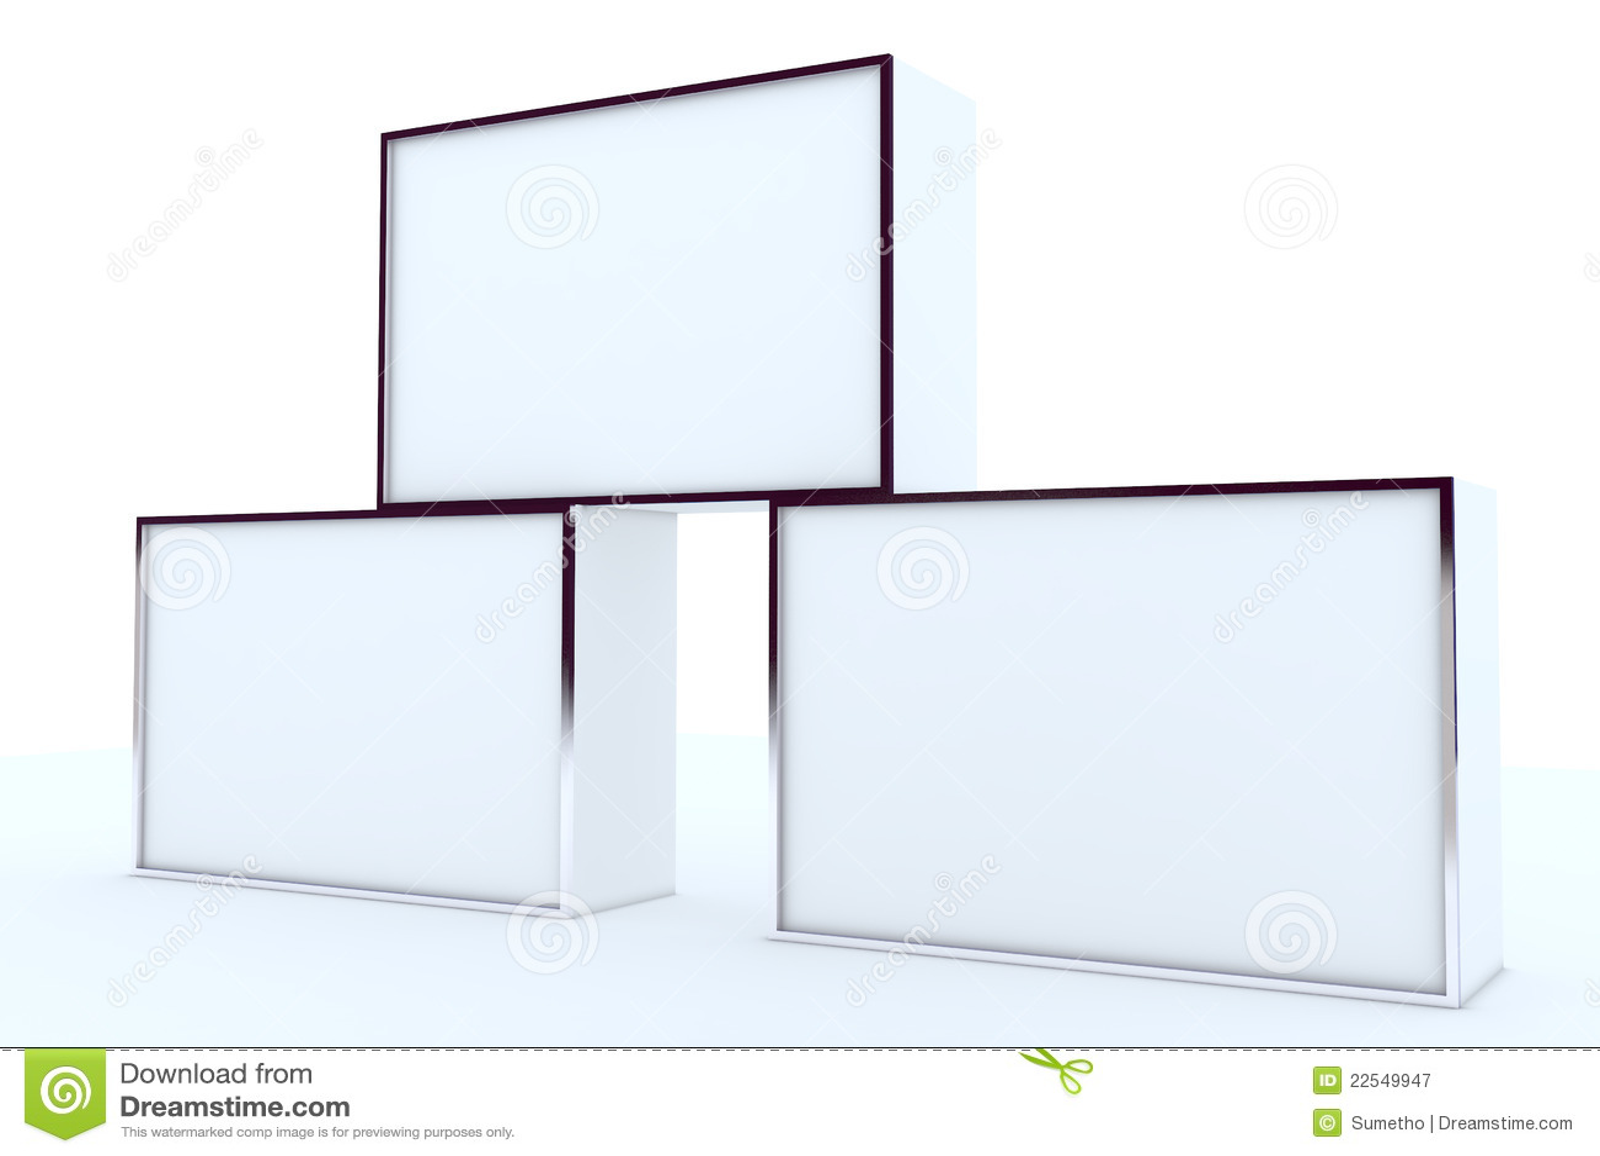 blank box display aluminum frame